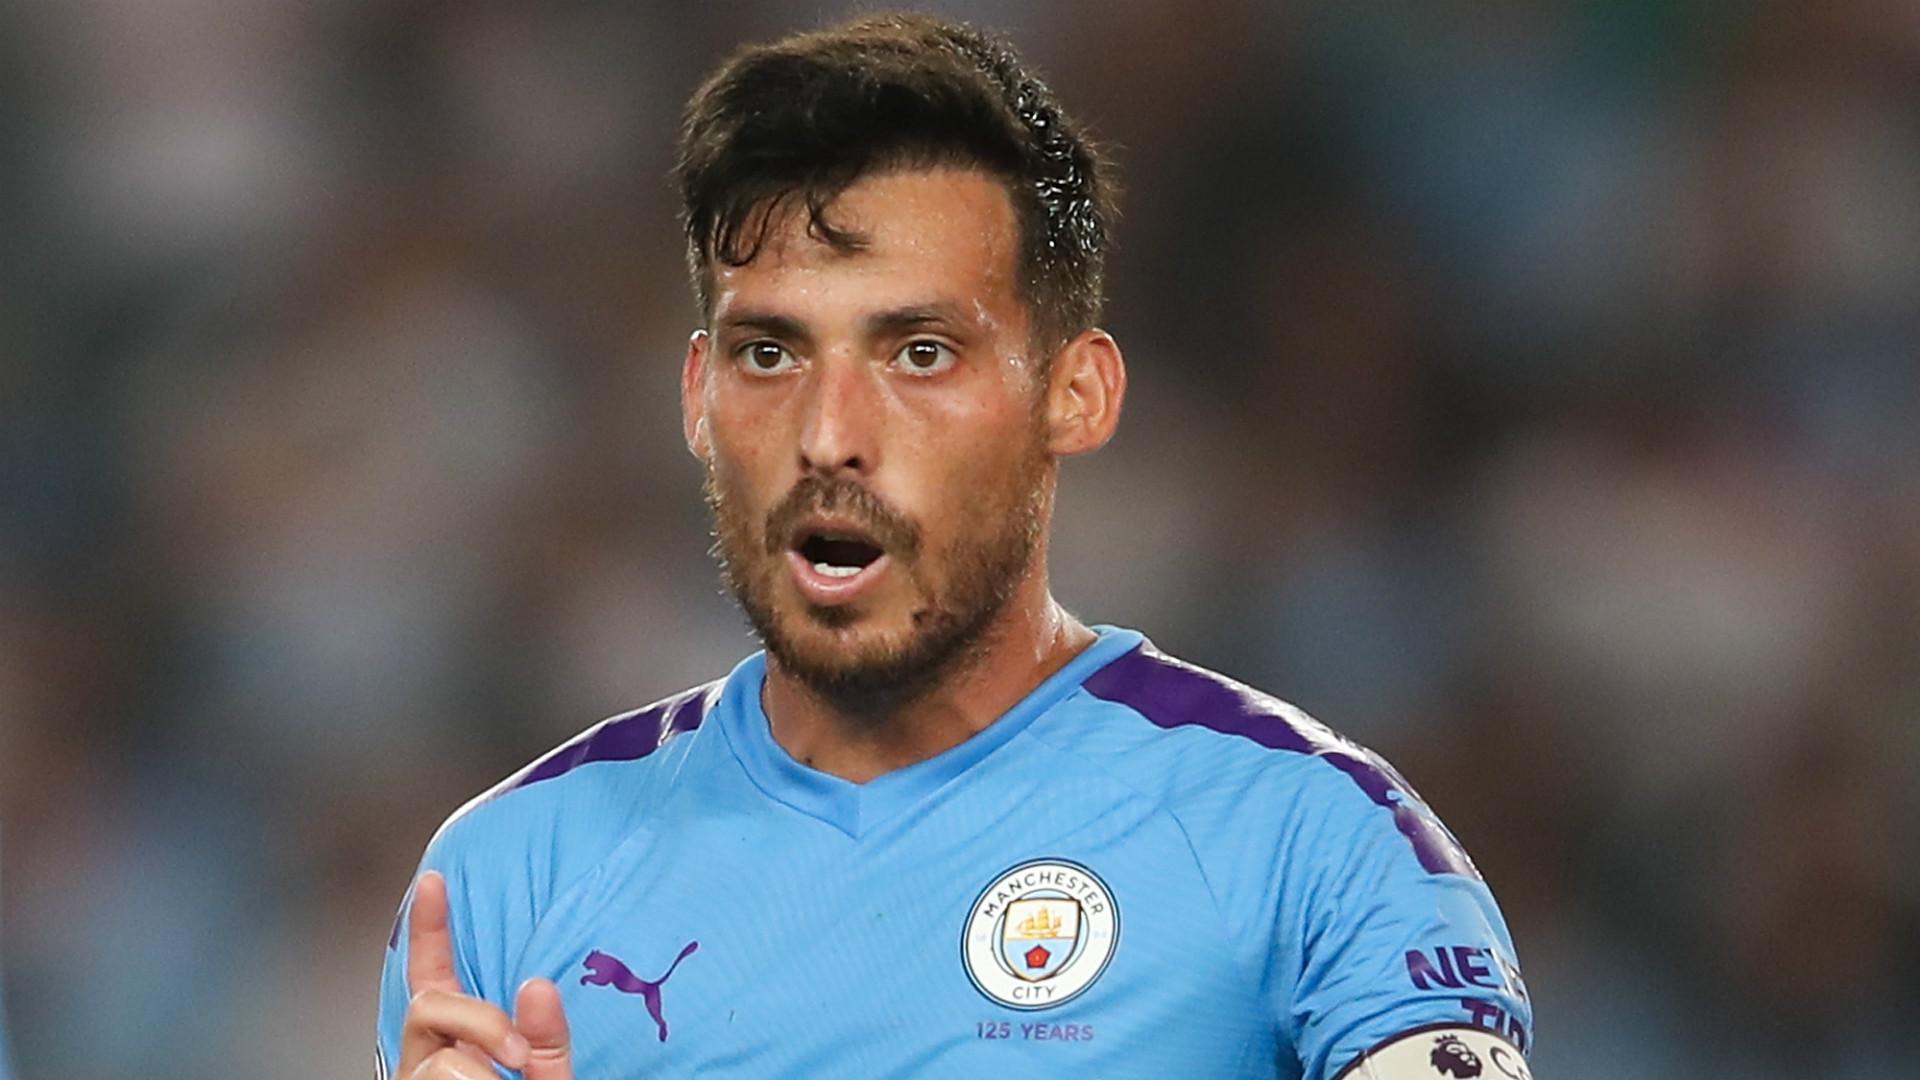 'Man City will always be grateful to Silva' - Spanish playmaker's Etihad career has been 'extraordinary', says Guardiola